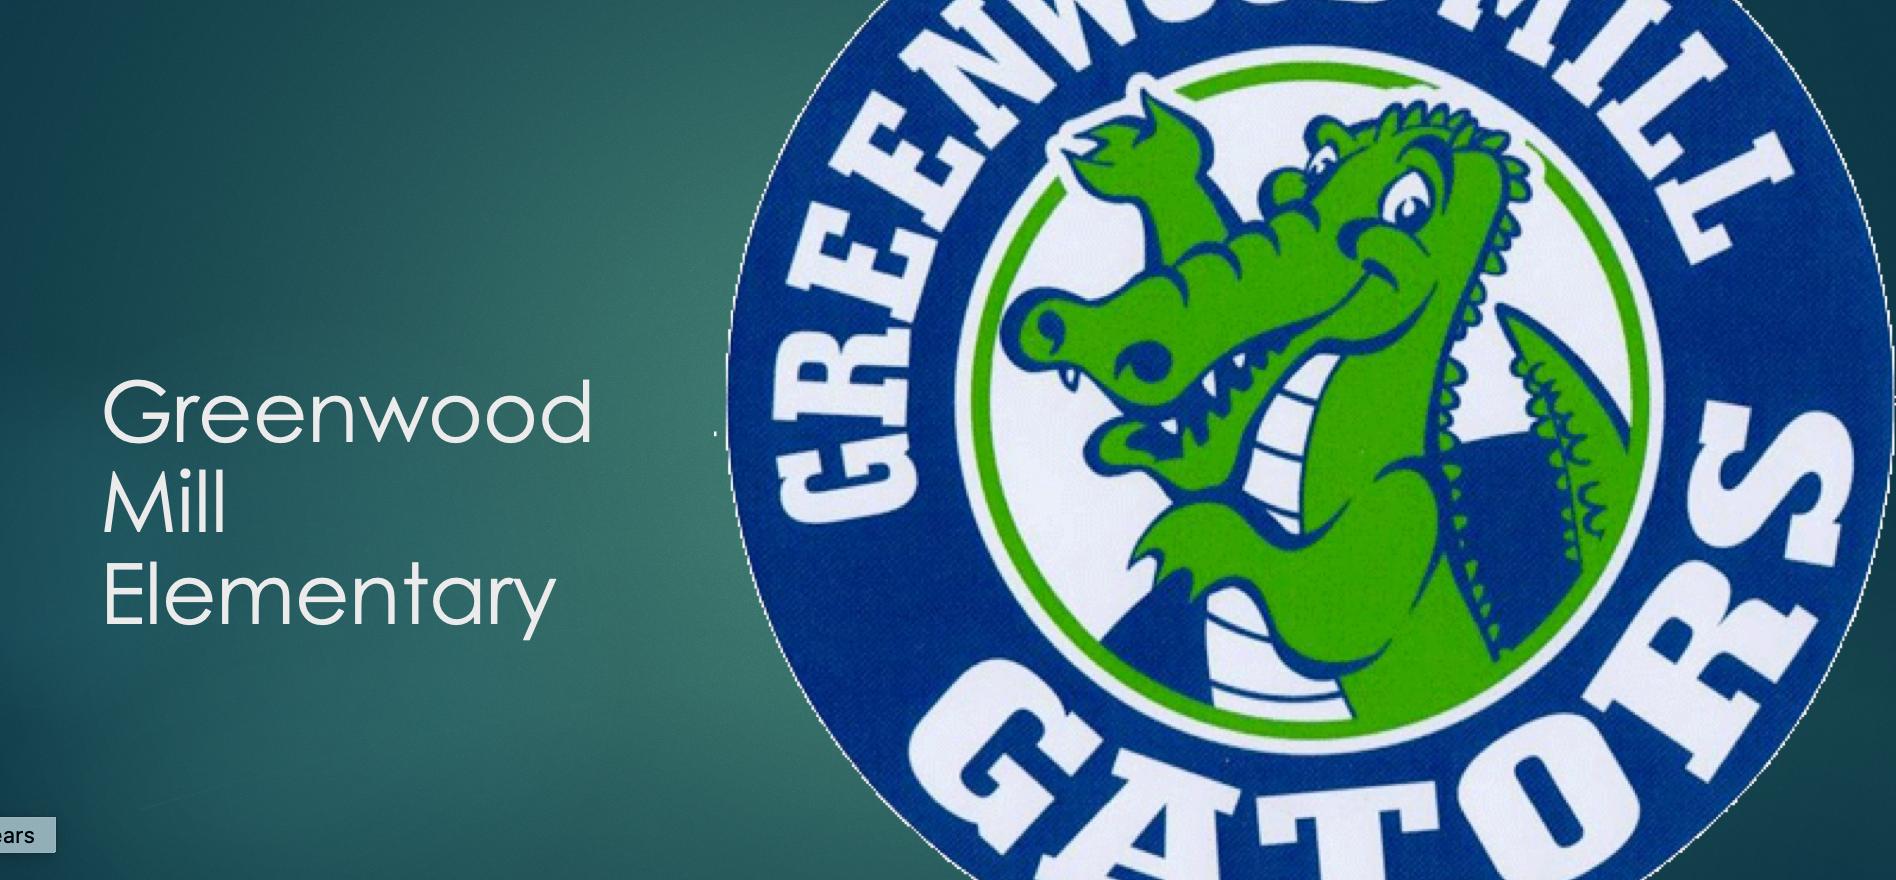 GREENWOODMILL ELEMENTARY